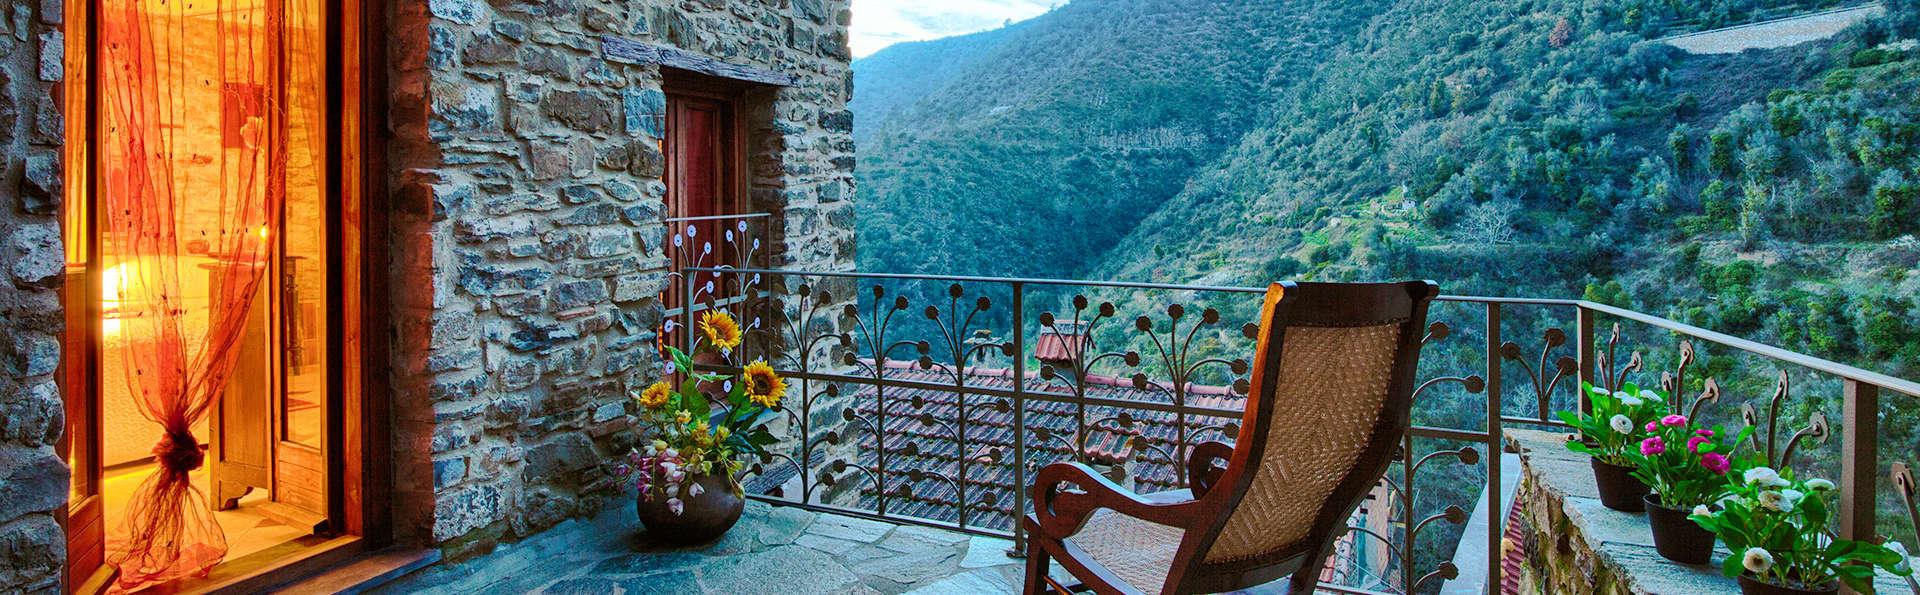 Weekend con visita guidata al paese di montagna Apricale